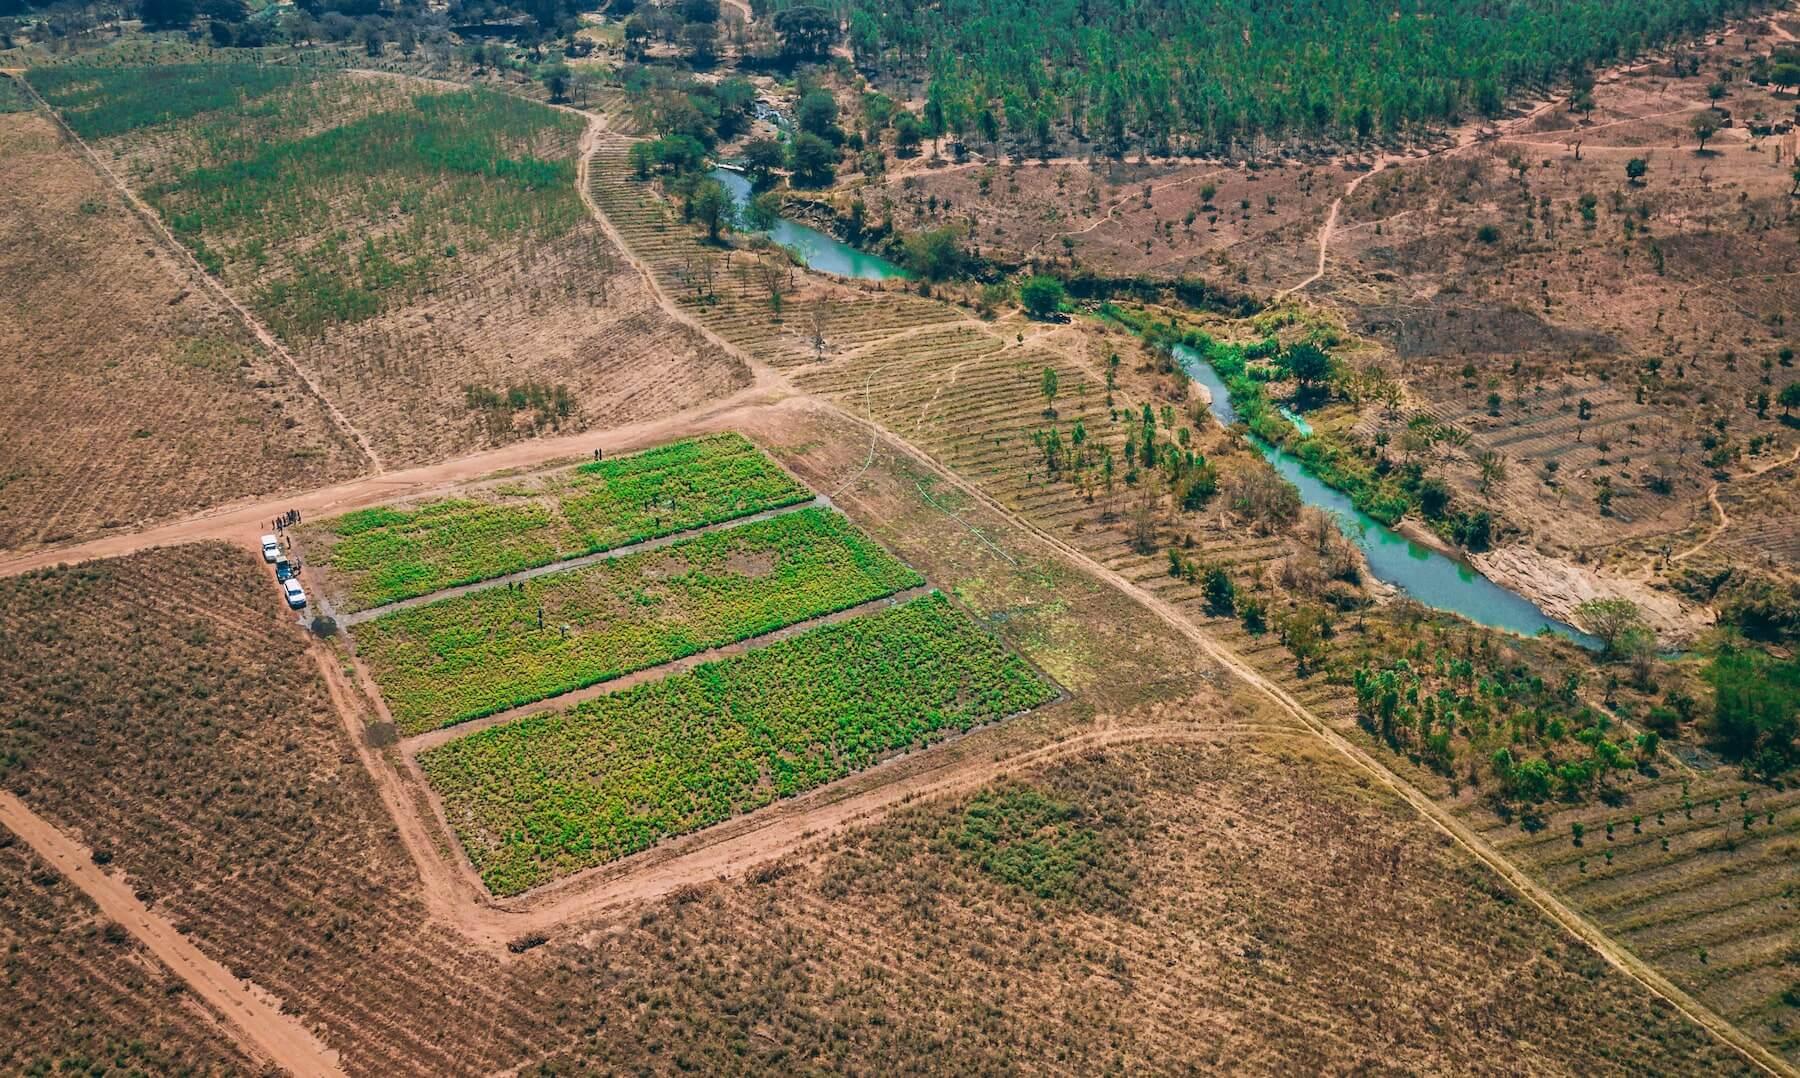 Yamba Health Farm, Malawi